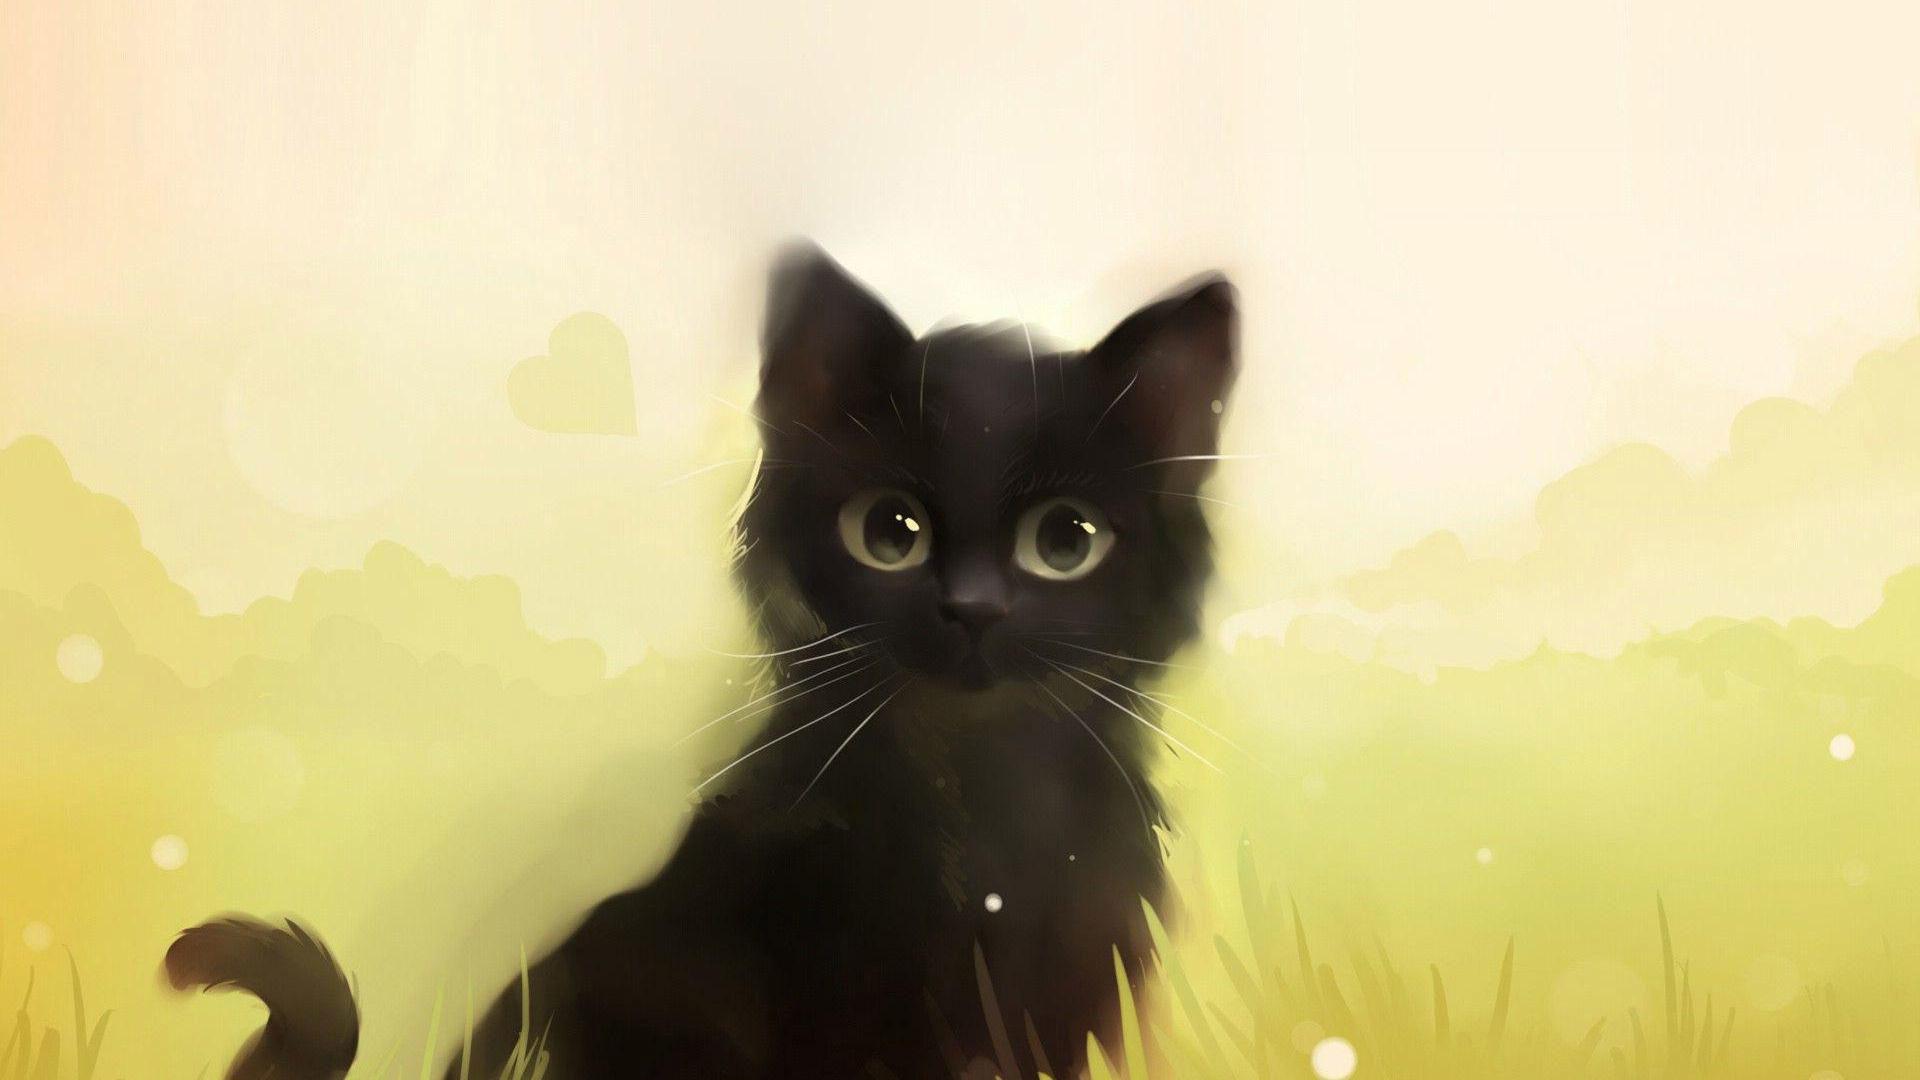 Cute Animated Black Cat Cute Black Cat Animated 1920x1080 Download Hd Wallpaper Wallpapertip